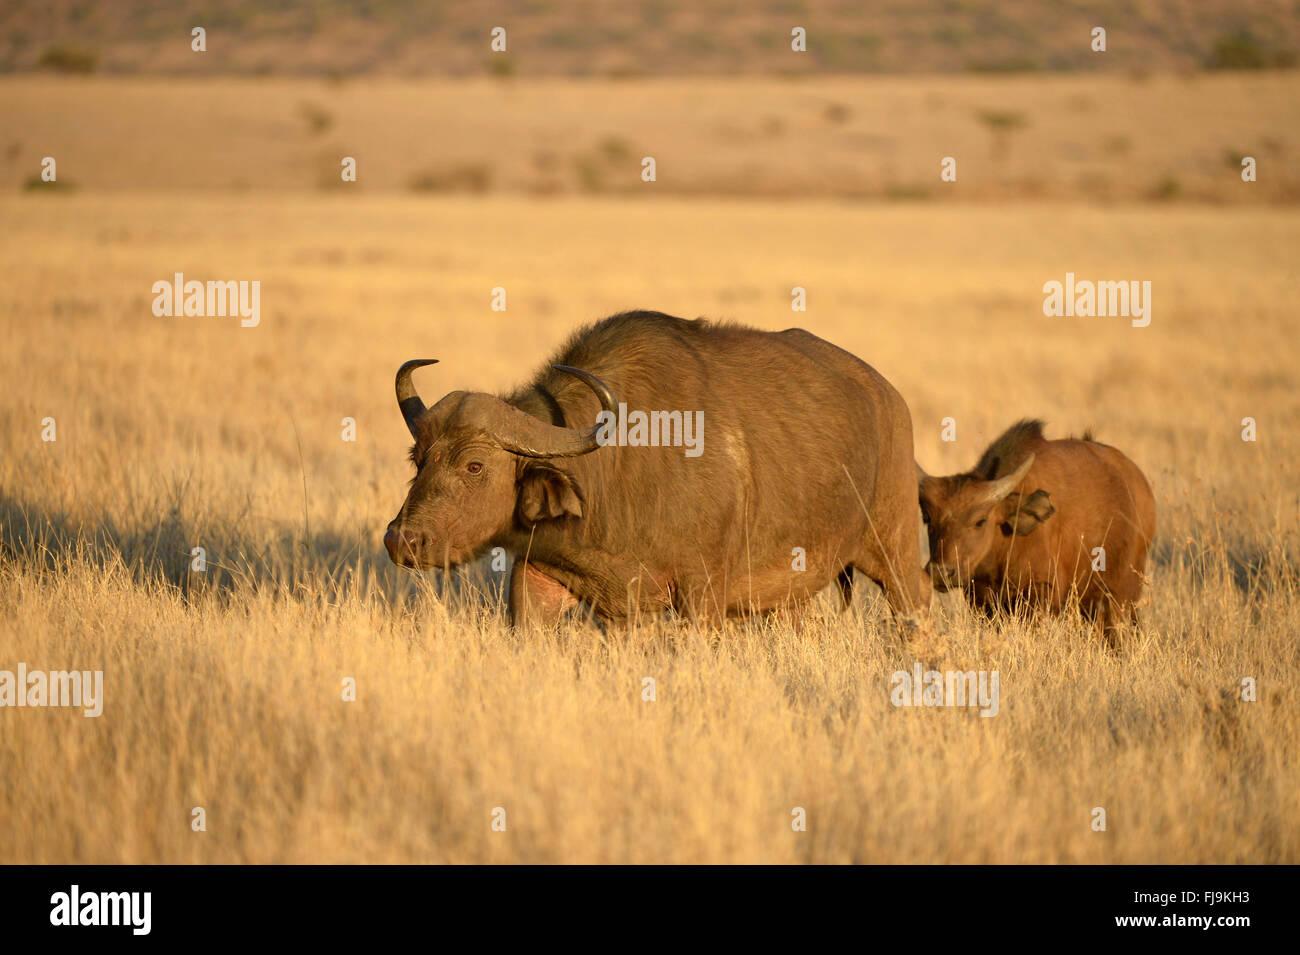 African Buffalo (Syncerus caffer) female walking through dry grassland, with calf following, Lewa Wildlife Conservancy, - Stock Image